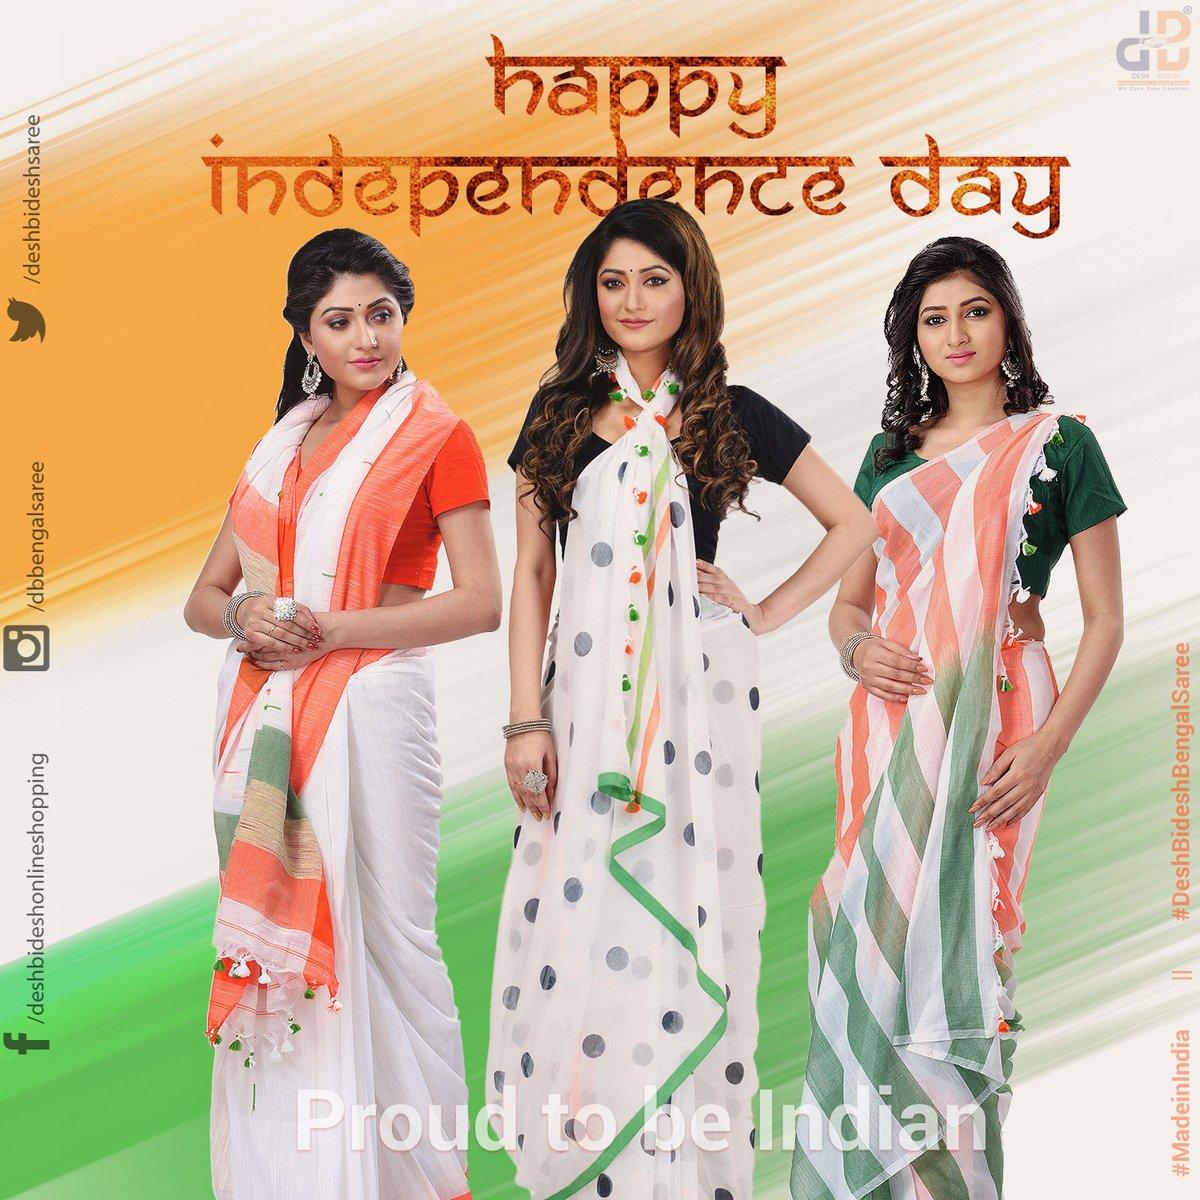 Wish you all a Happy Independence Day from Desh Bidesh Bengal Saree! Get them here: https://t.co/6yl3iv7StB #IndependenceDay #SareeTwitter #SareeBlouse #IndianSaree #SareeLover #FashionBlogger #Traditionalwear #EthnicWear #Saree #MadeinIndia #SareeSwag https://t.co/jyoFnQX1Rr